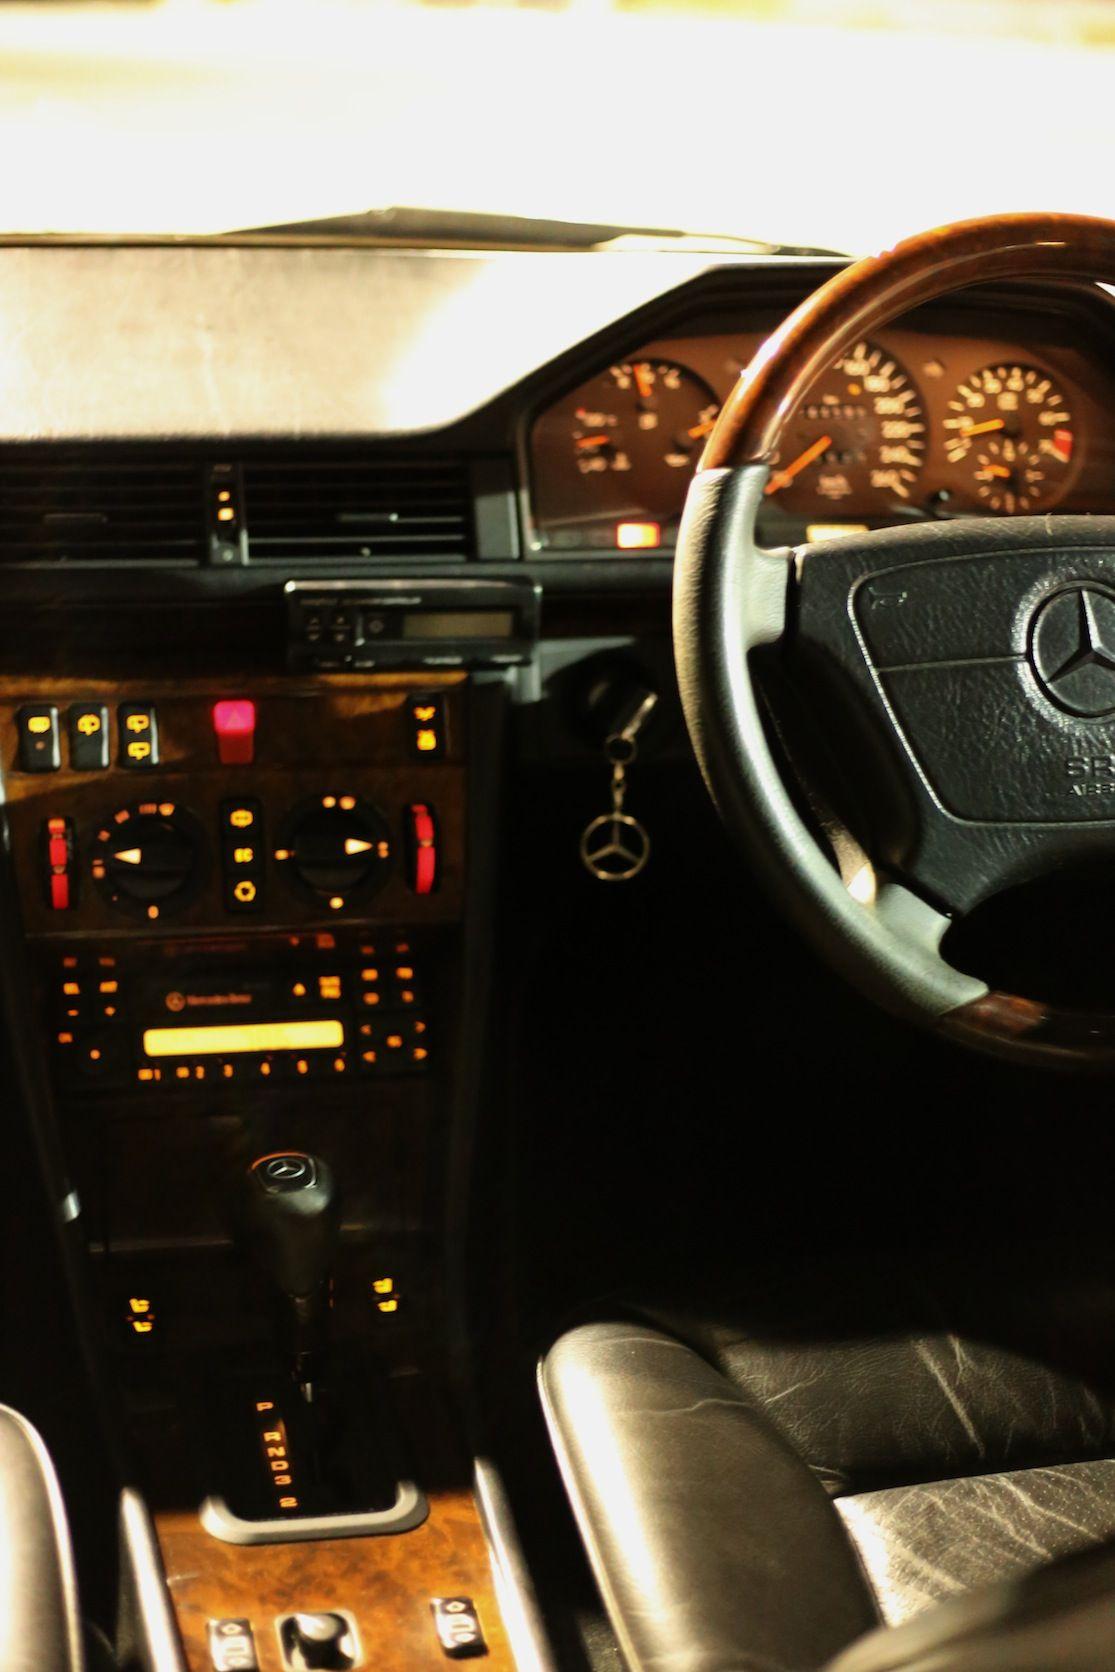 Mercedes Benz W124 S124 E320t 94 Jewelryapple Airstream エアストリーム メルセデス ステーションワゴン メルセデスベンツamg